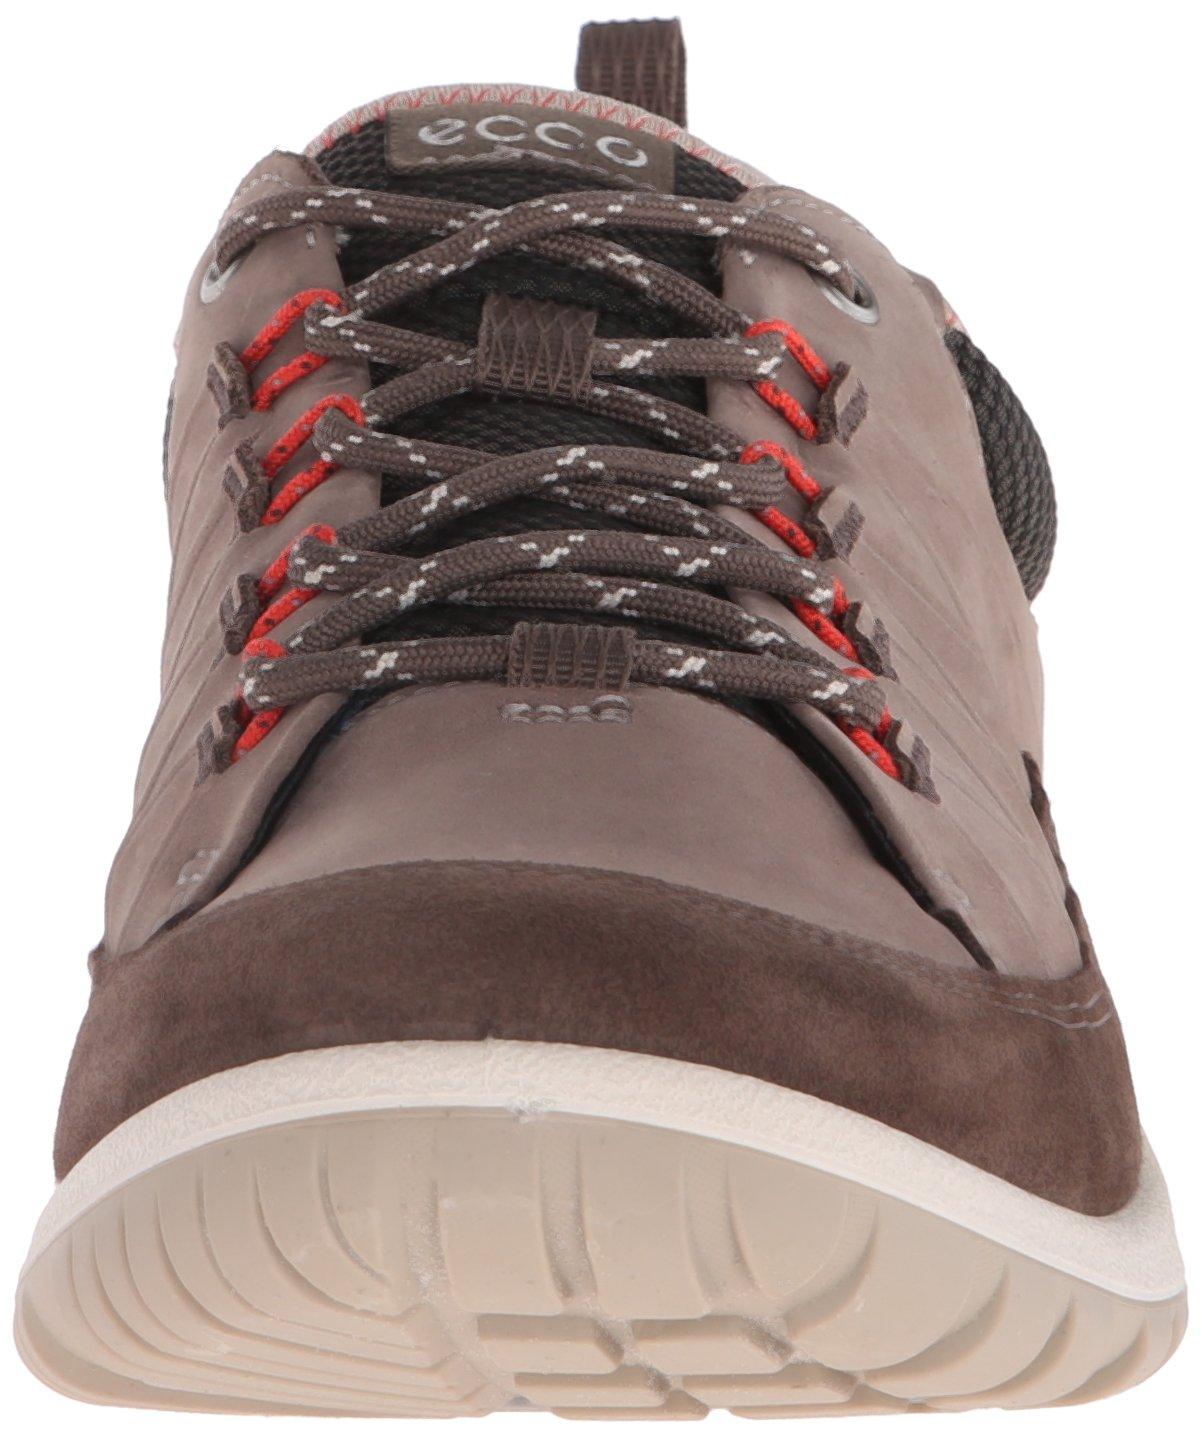 71P2aiUm6ZL - ECCO Women's Aspina Multisport Outdoor Shoes